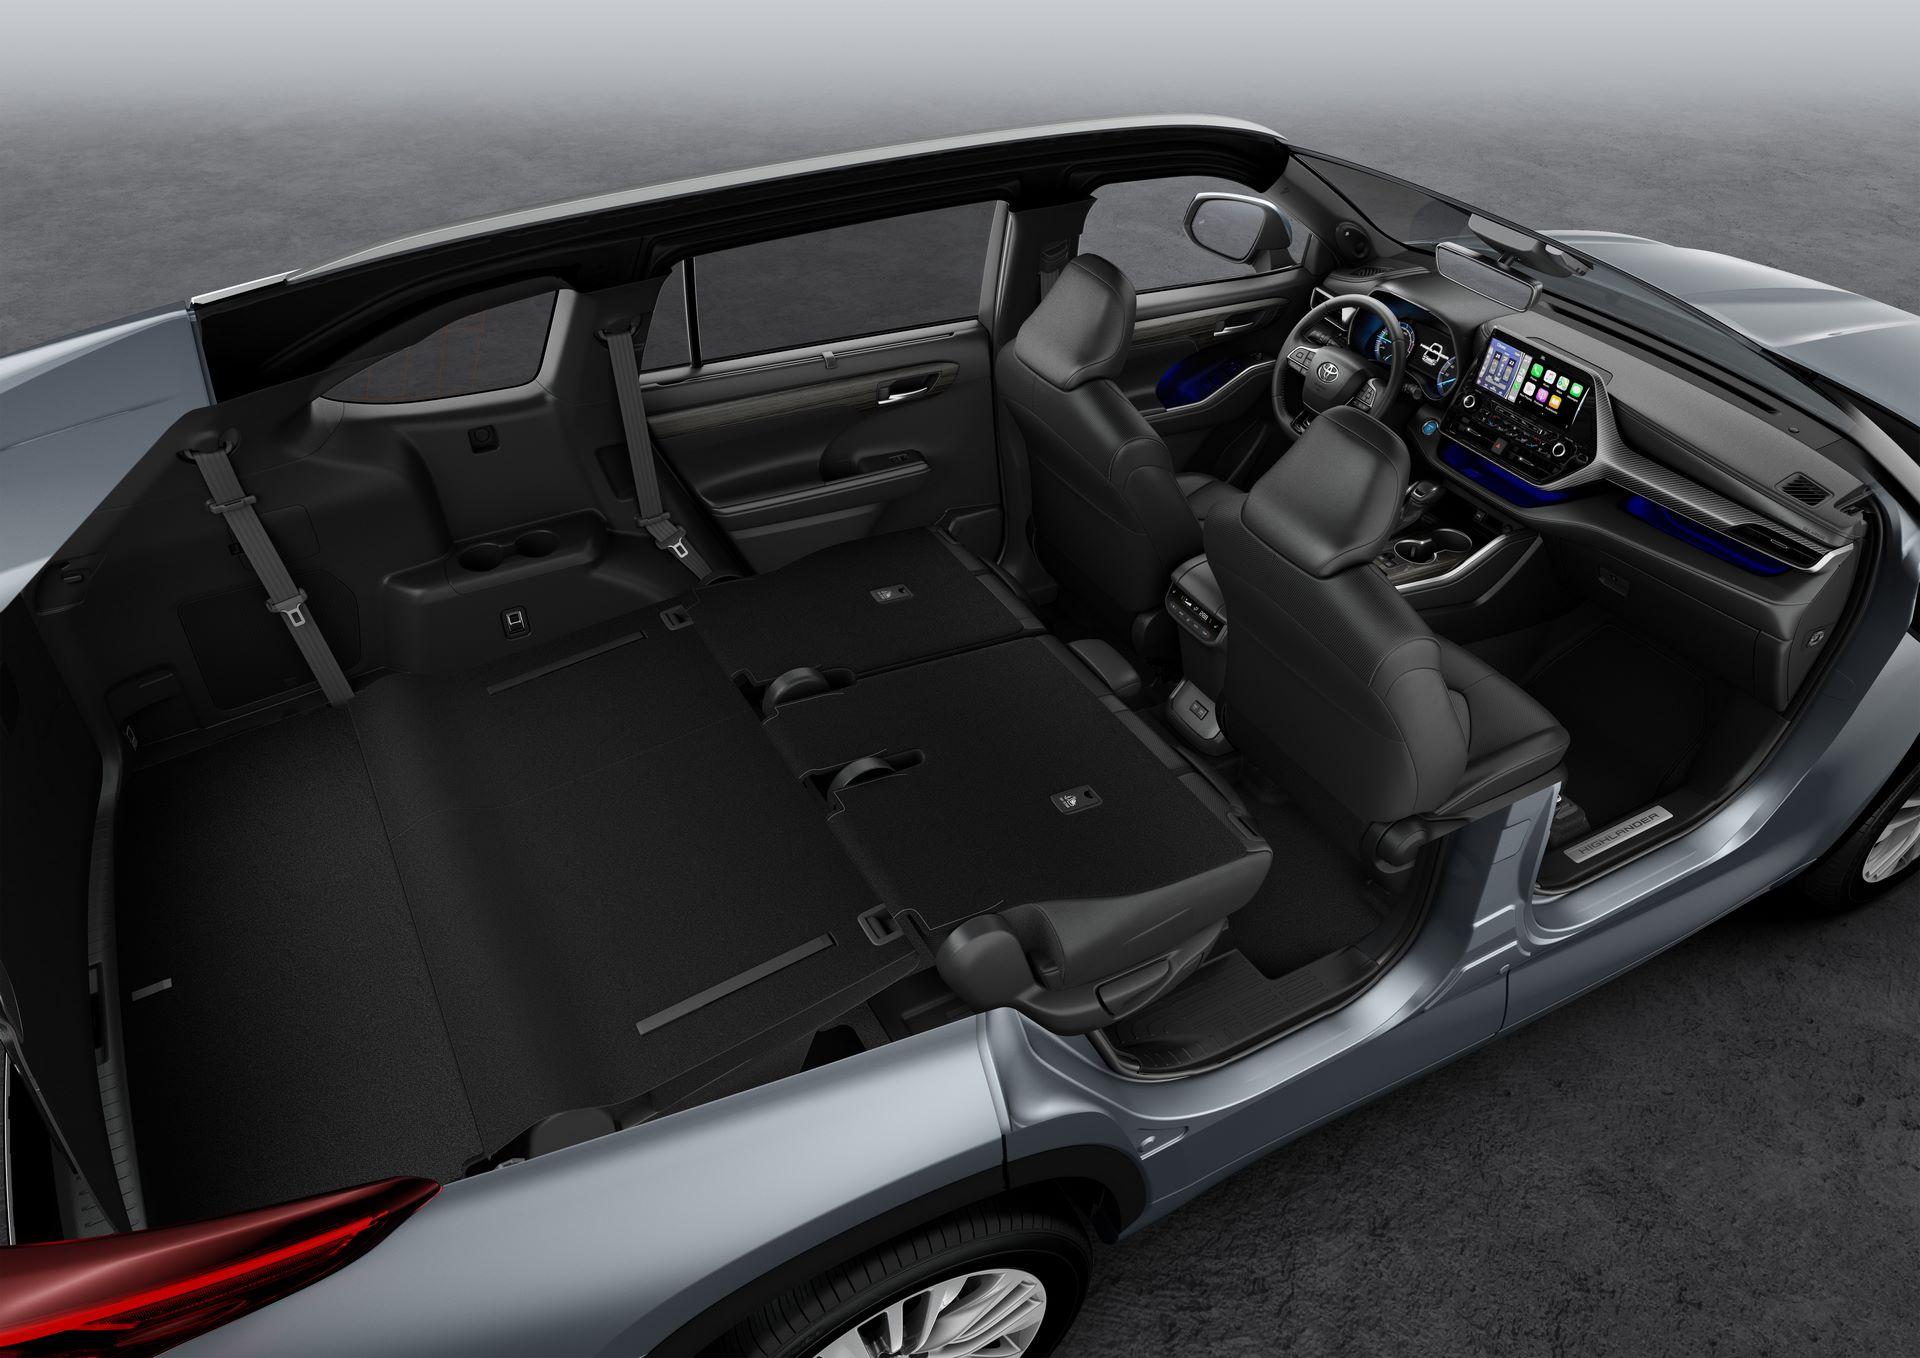 Toyota-Highlander-Europe-2021-4